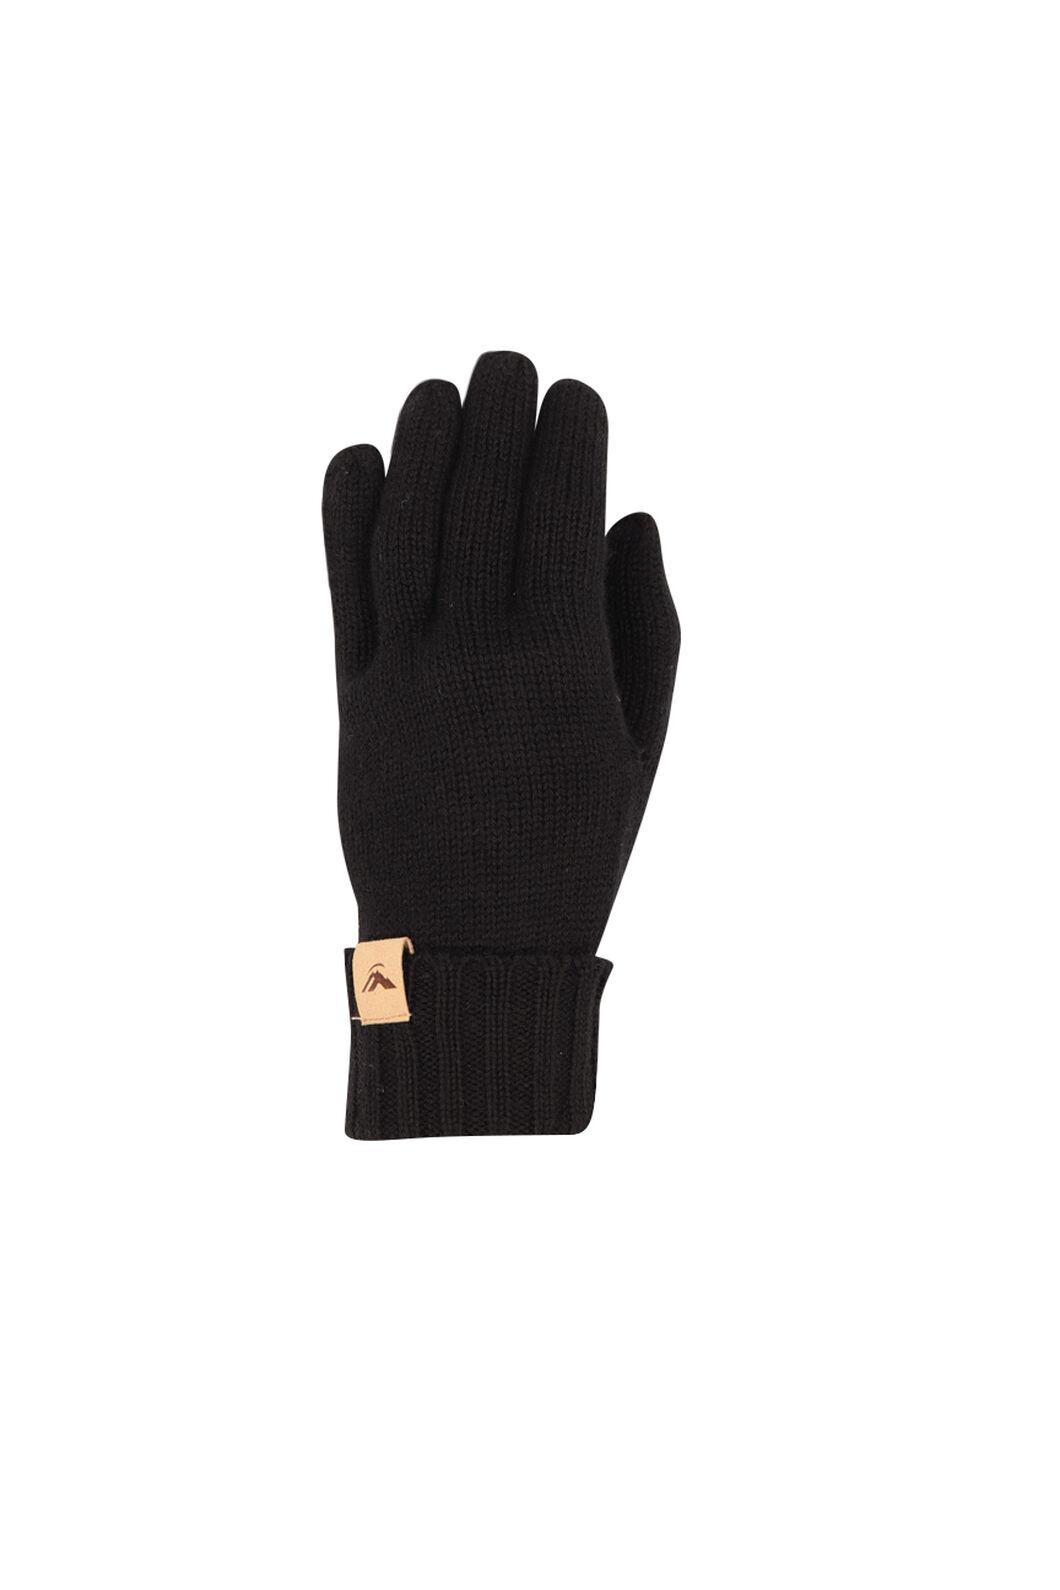 Macpac Merino Gloves, Black, hi-res